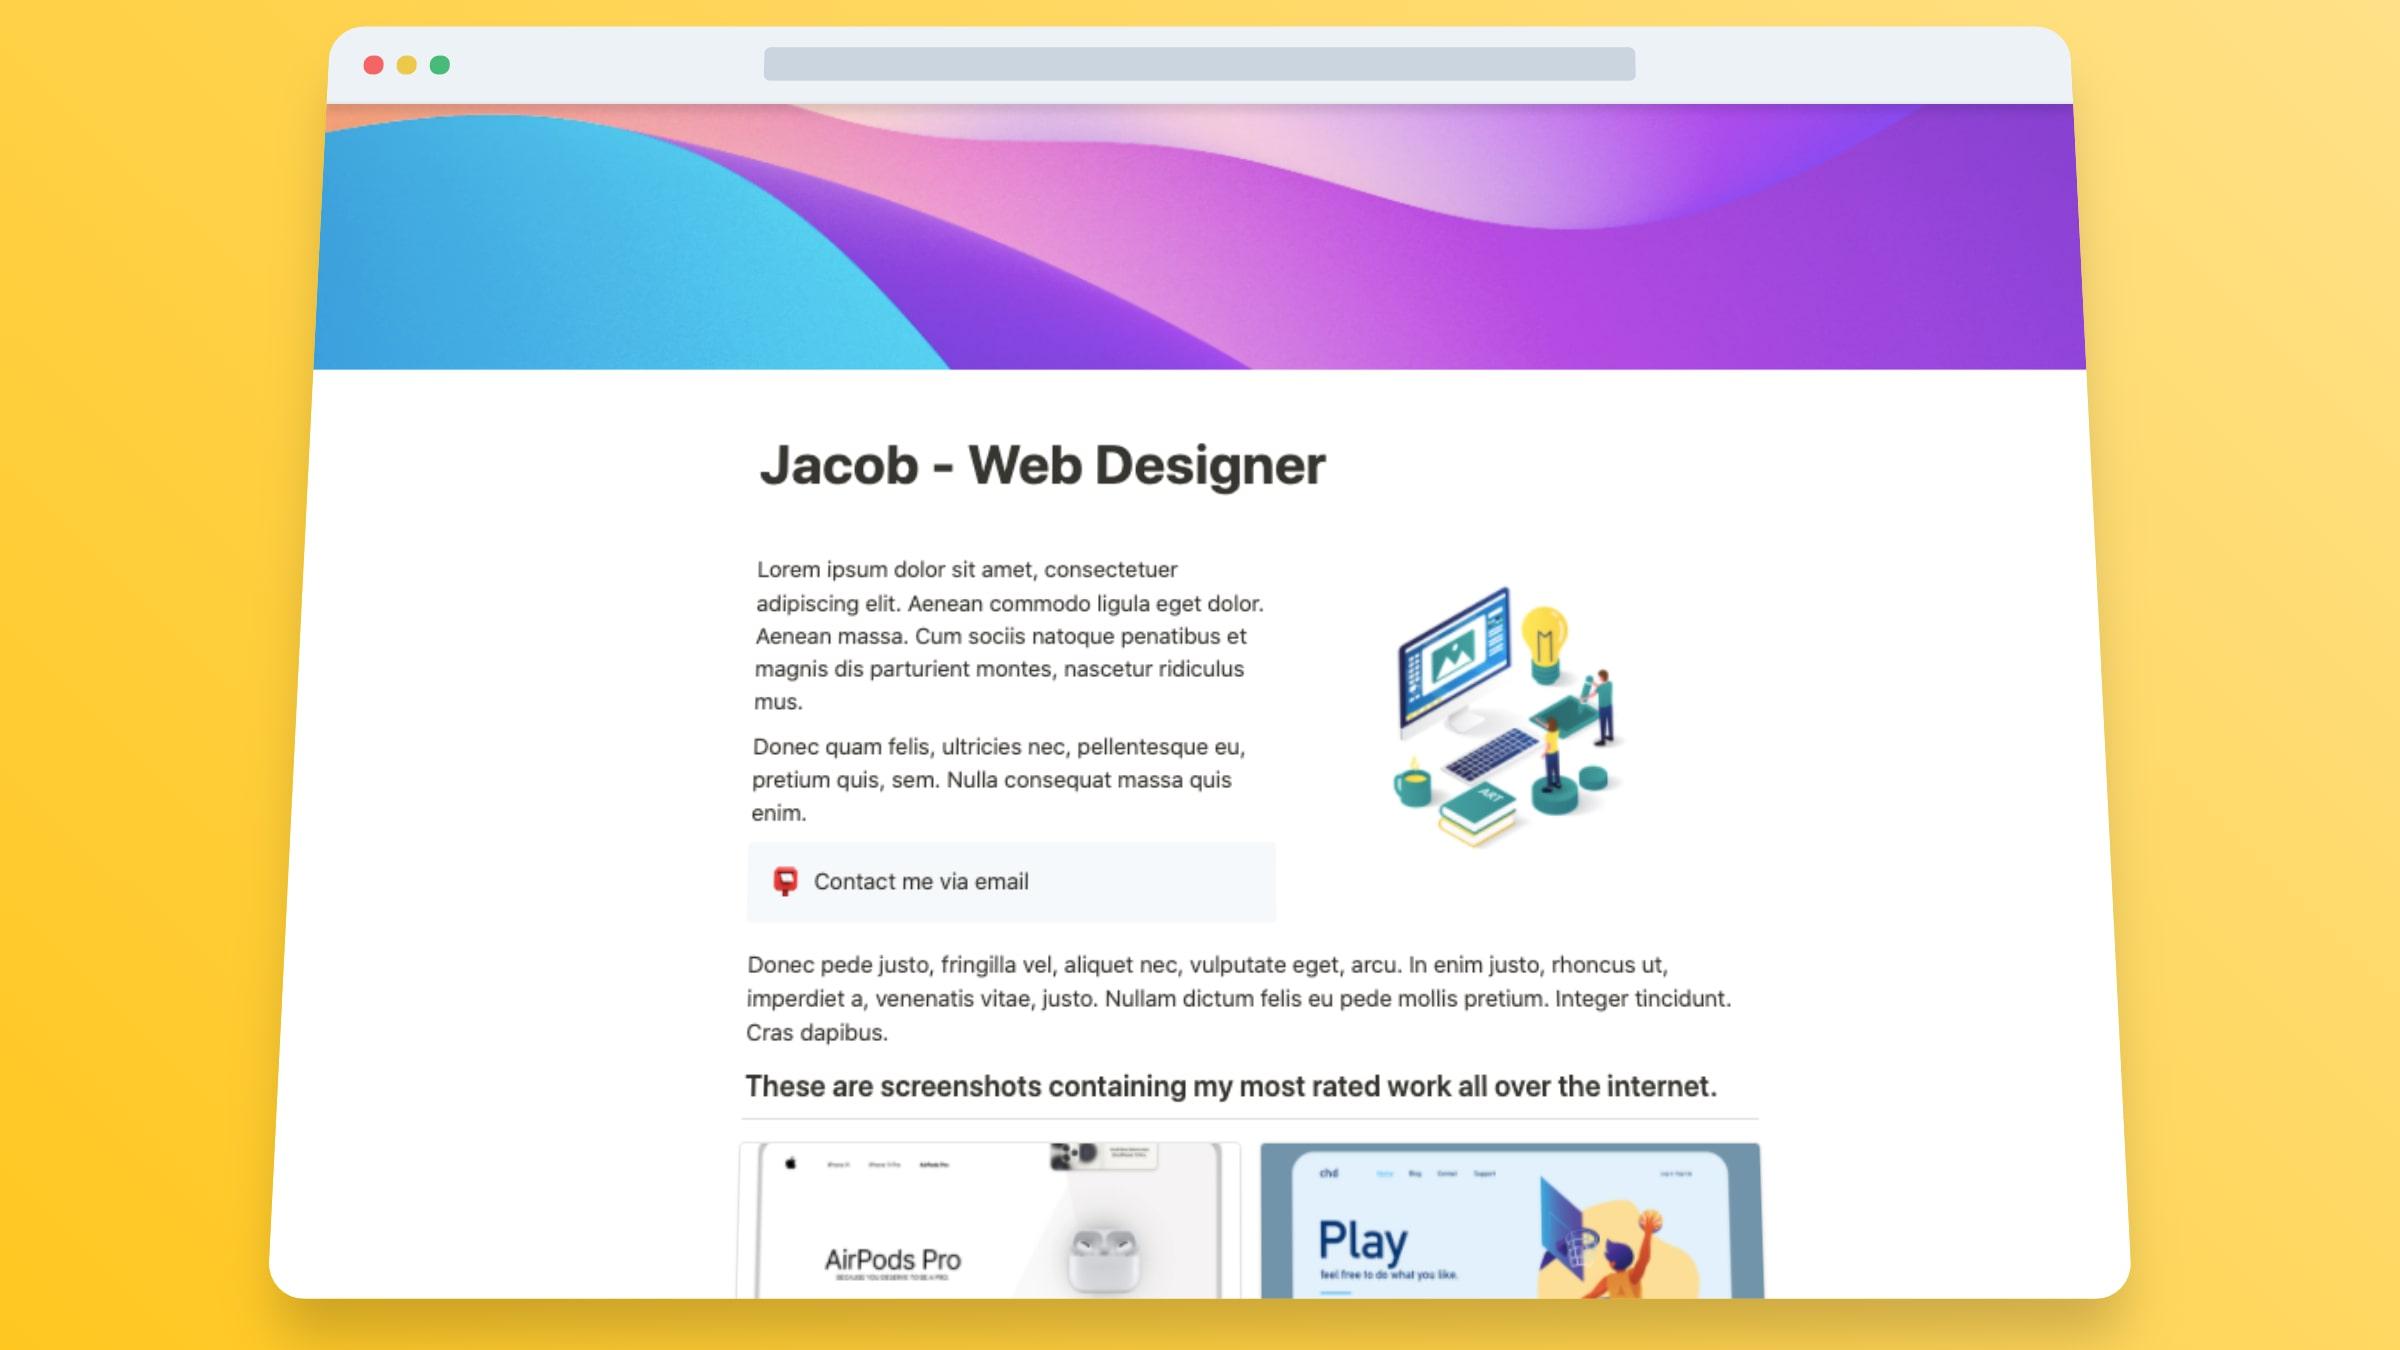 Designer Portfolio Website Template - Jacob